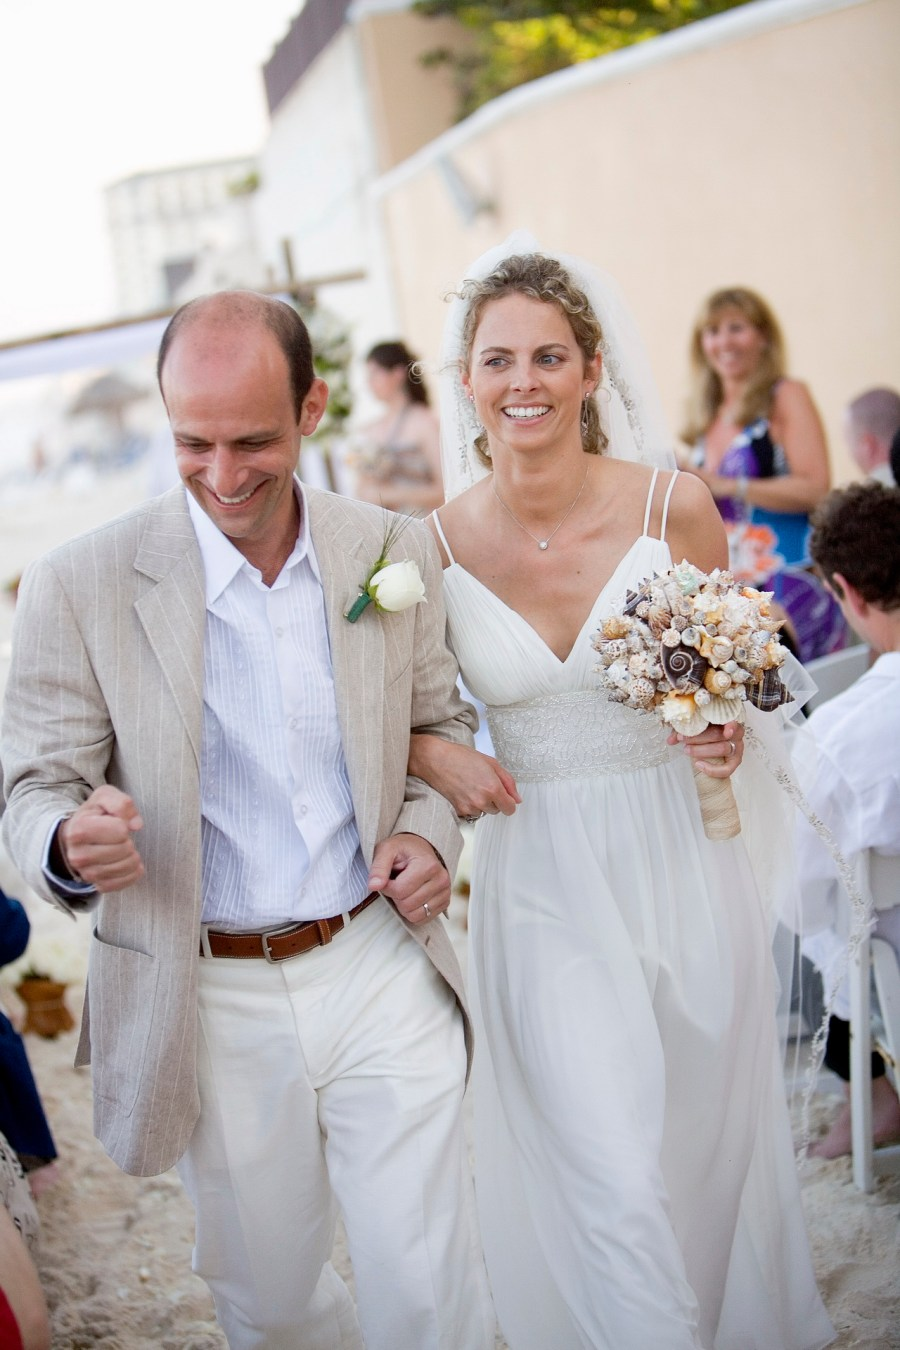 cancun_wedding_ritz_carlton_photo_Nicole_caldwell_05